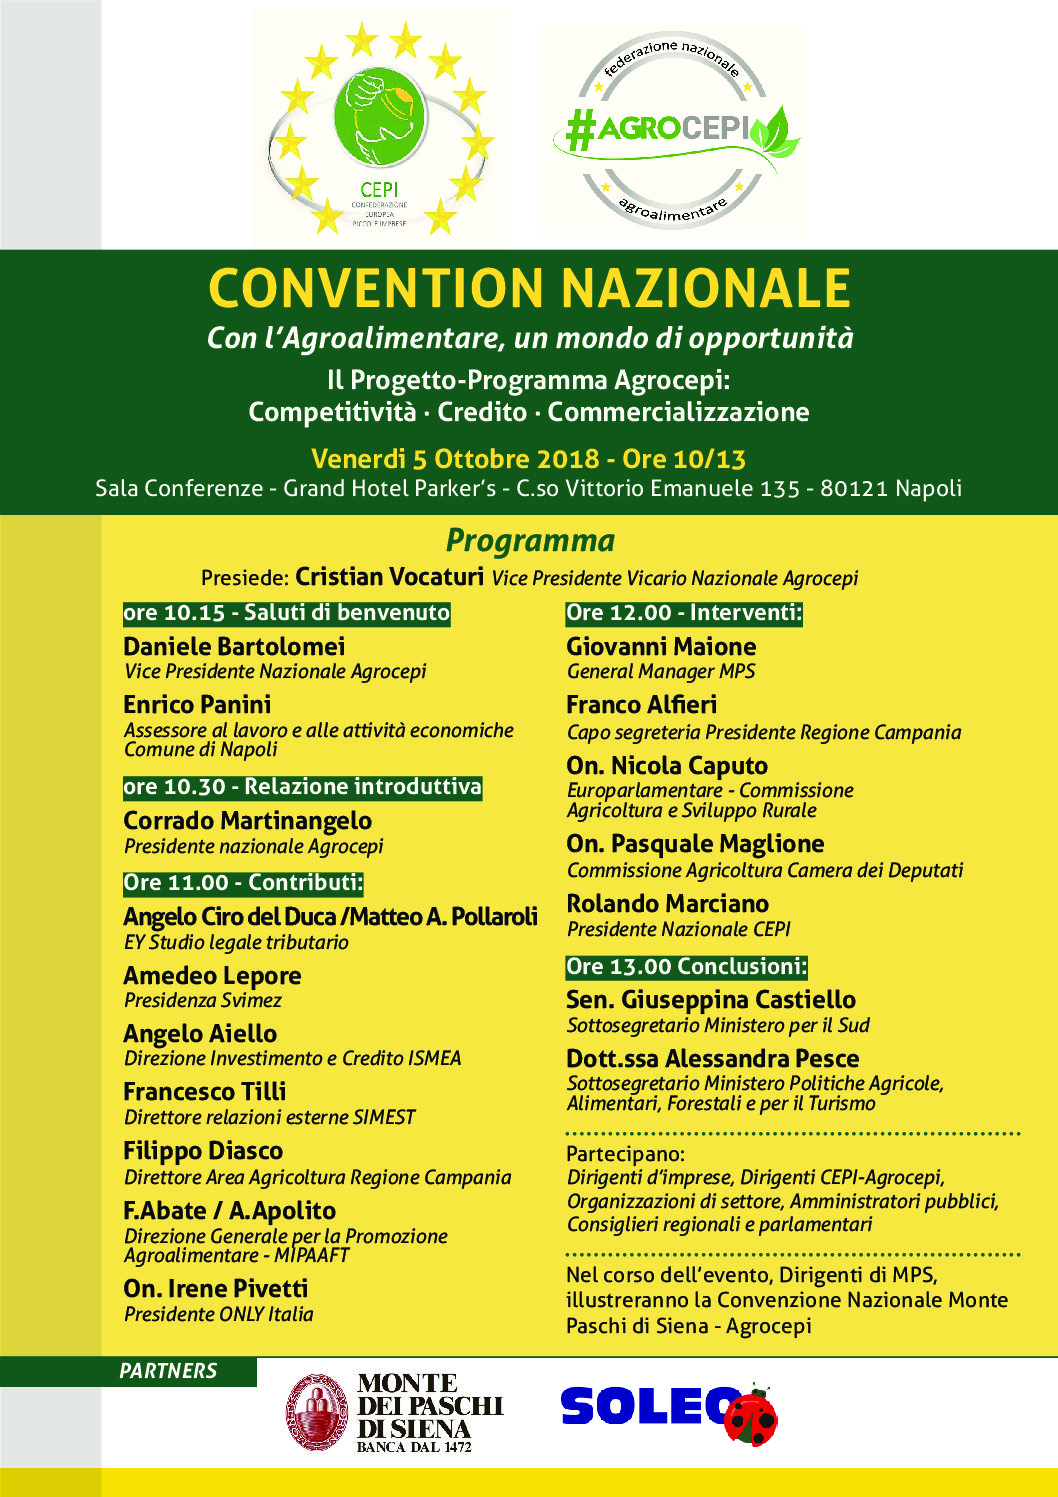 CONVENTION NAZIONALE #AGROCEPI – Venerdì 5 ottobre 2018